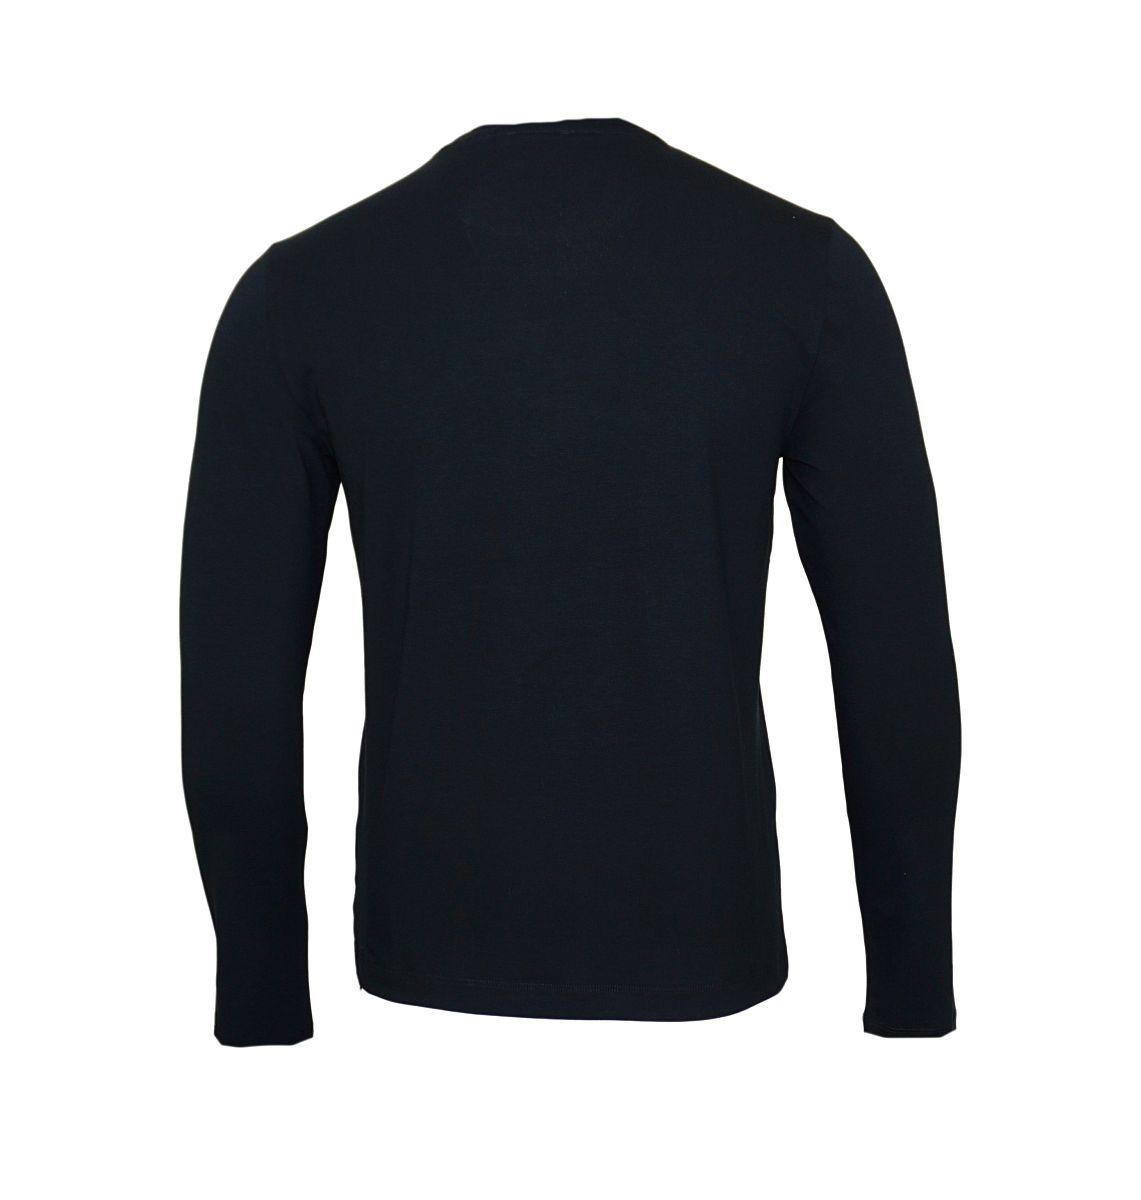 EA7 Emporio Armani Longsleeve Shirt T-Shirt 6YPTB3 PJ20Z 1578 Night Blue HW17-EALS1